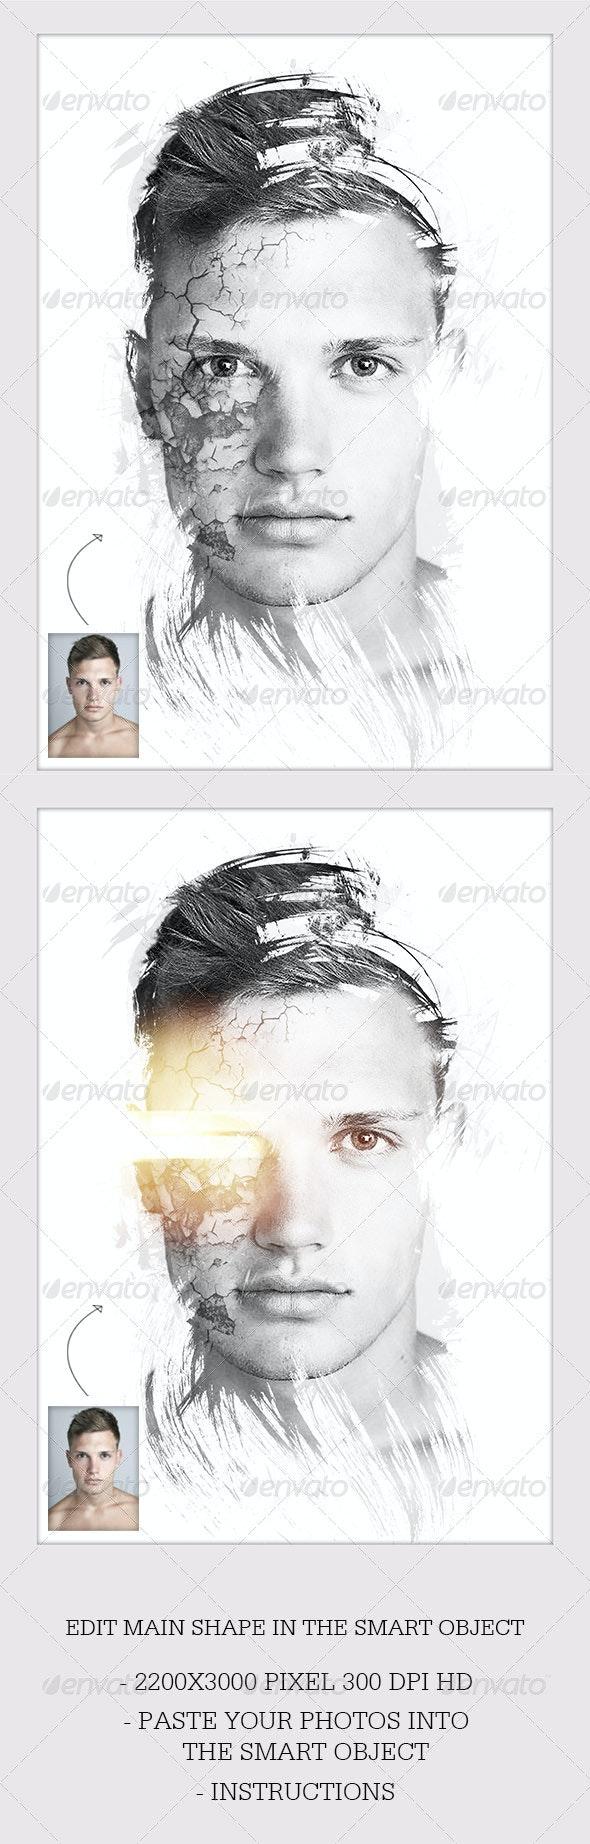 Dream Photo Template Sci-Fi - Artistic Photo Templates